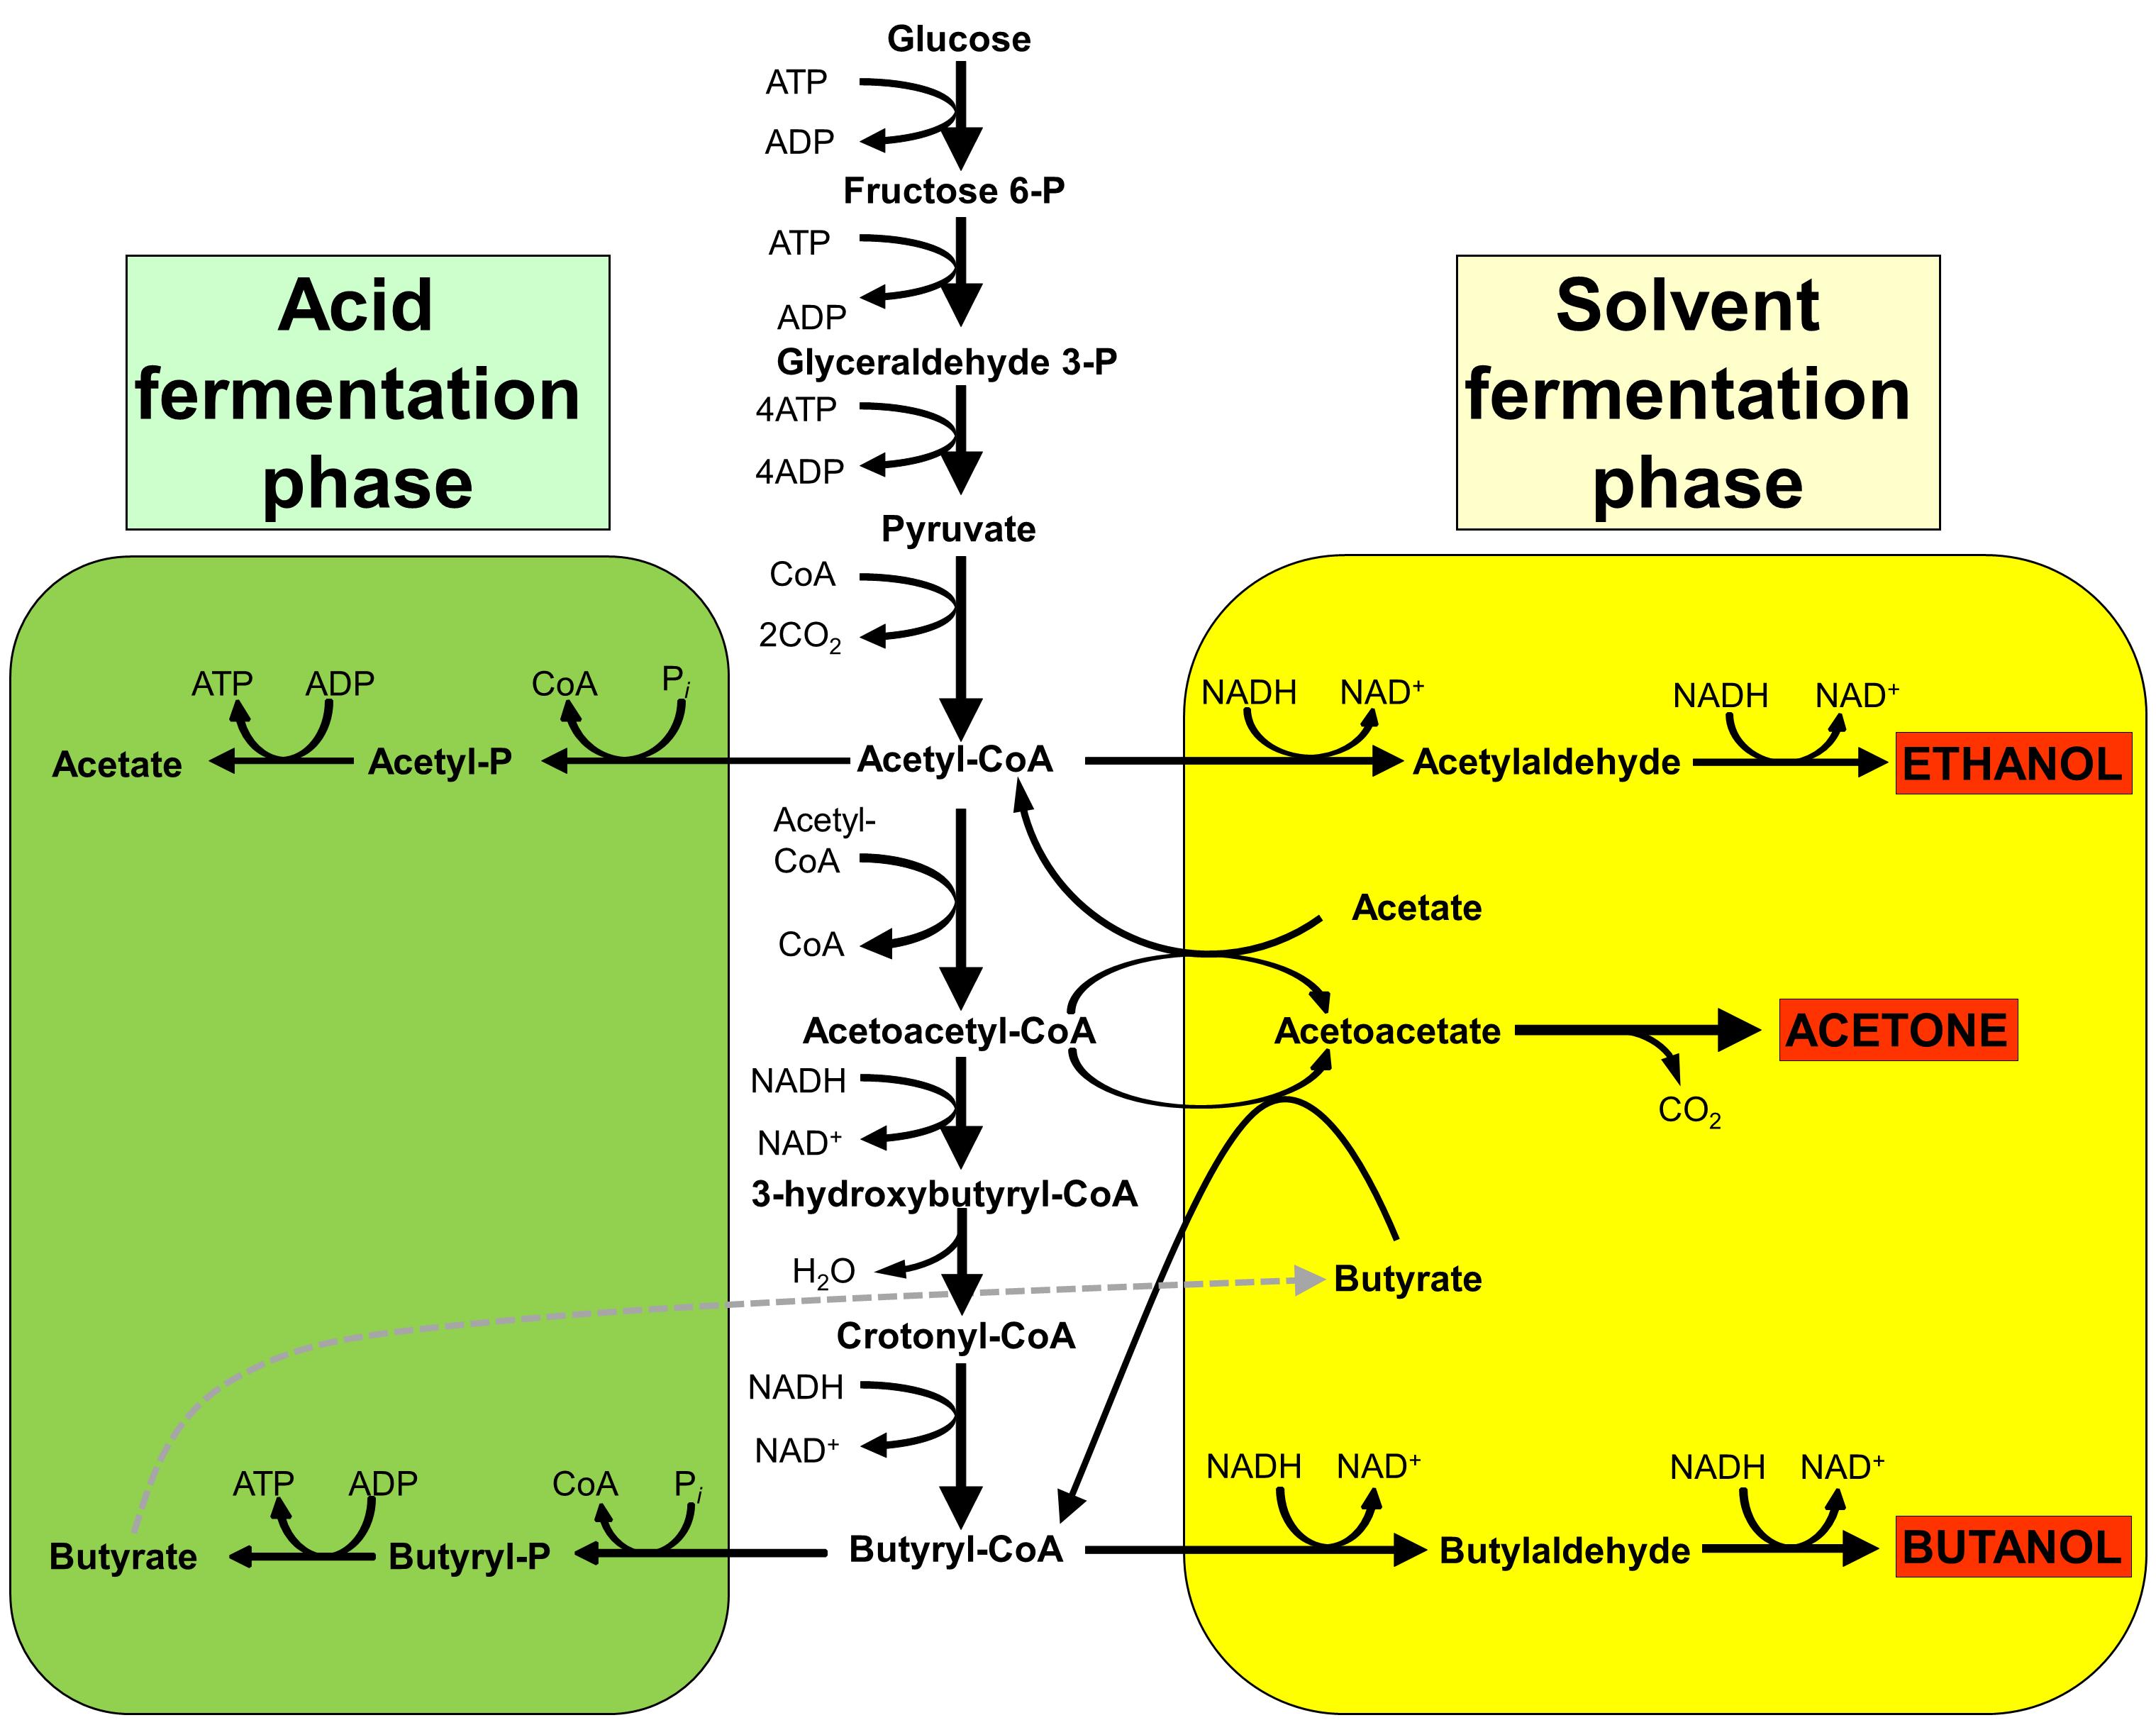 acetone–butanol–ethanol fermentation - wikipedia